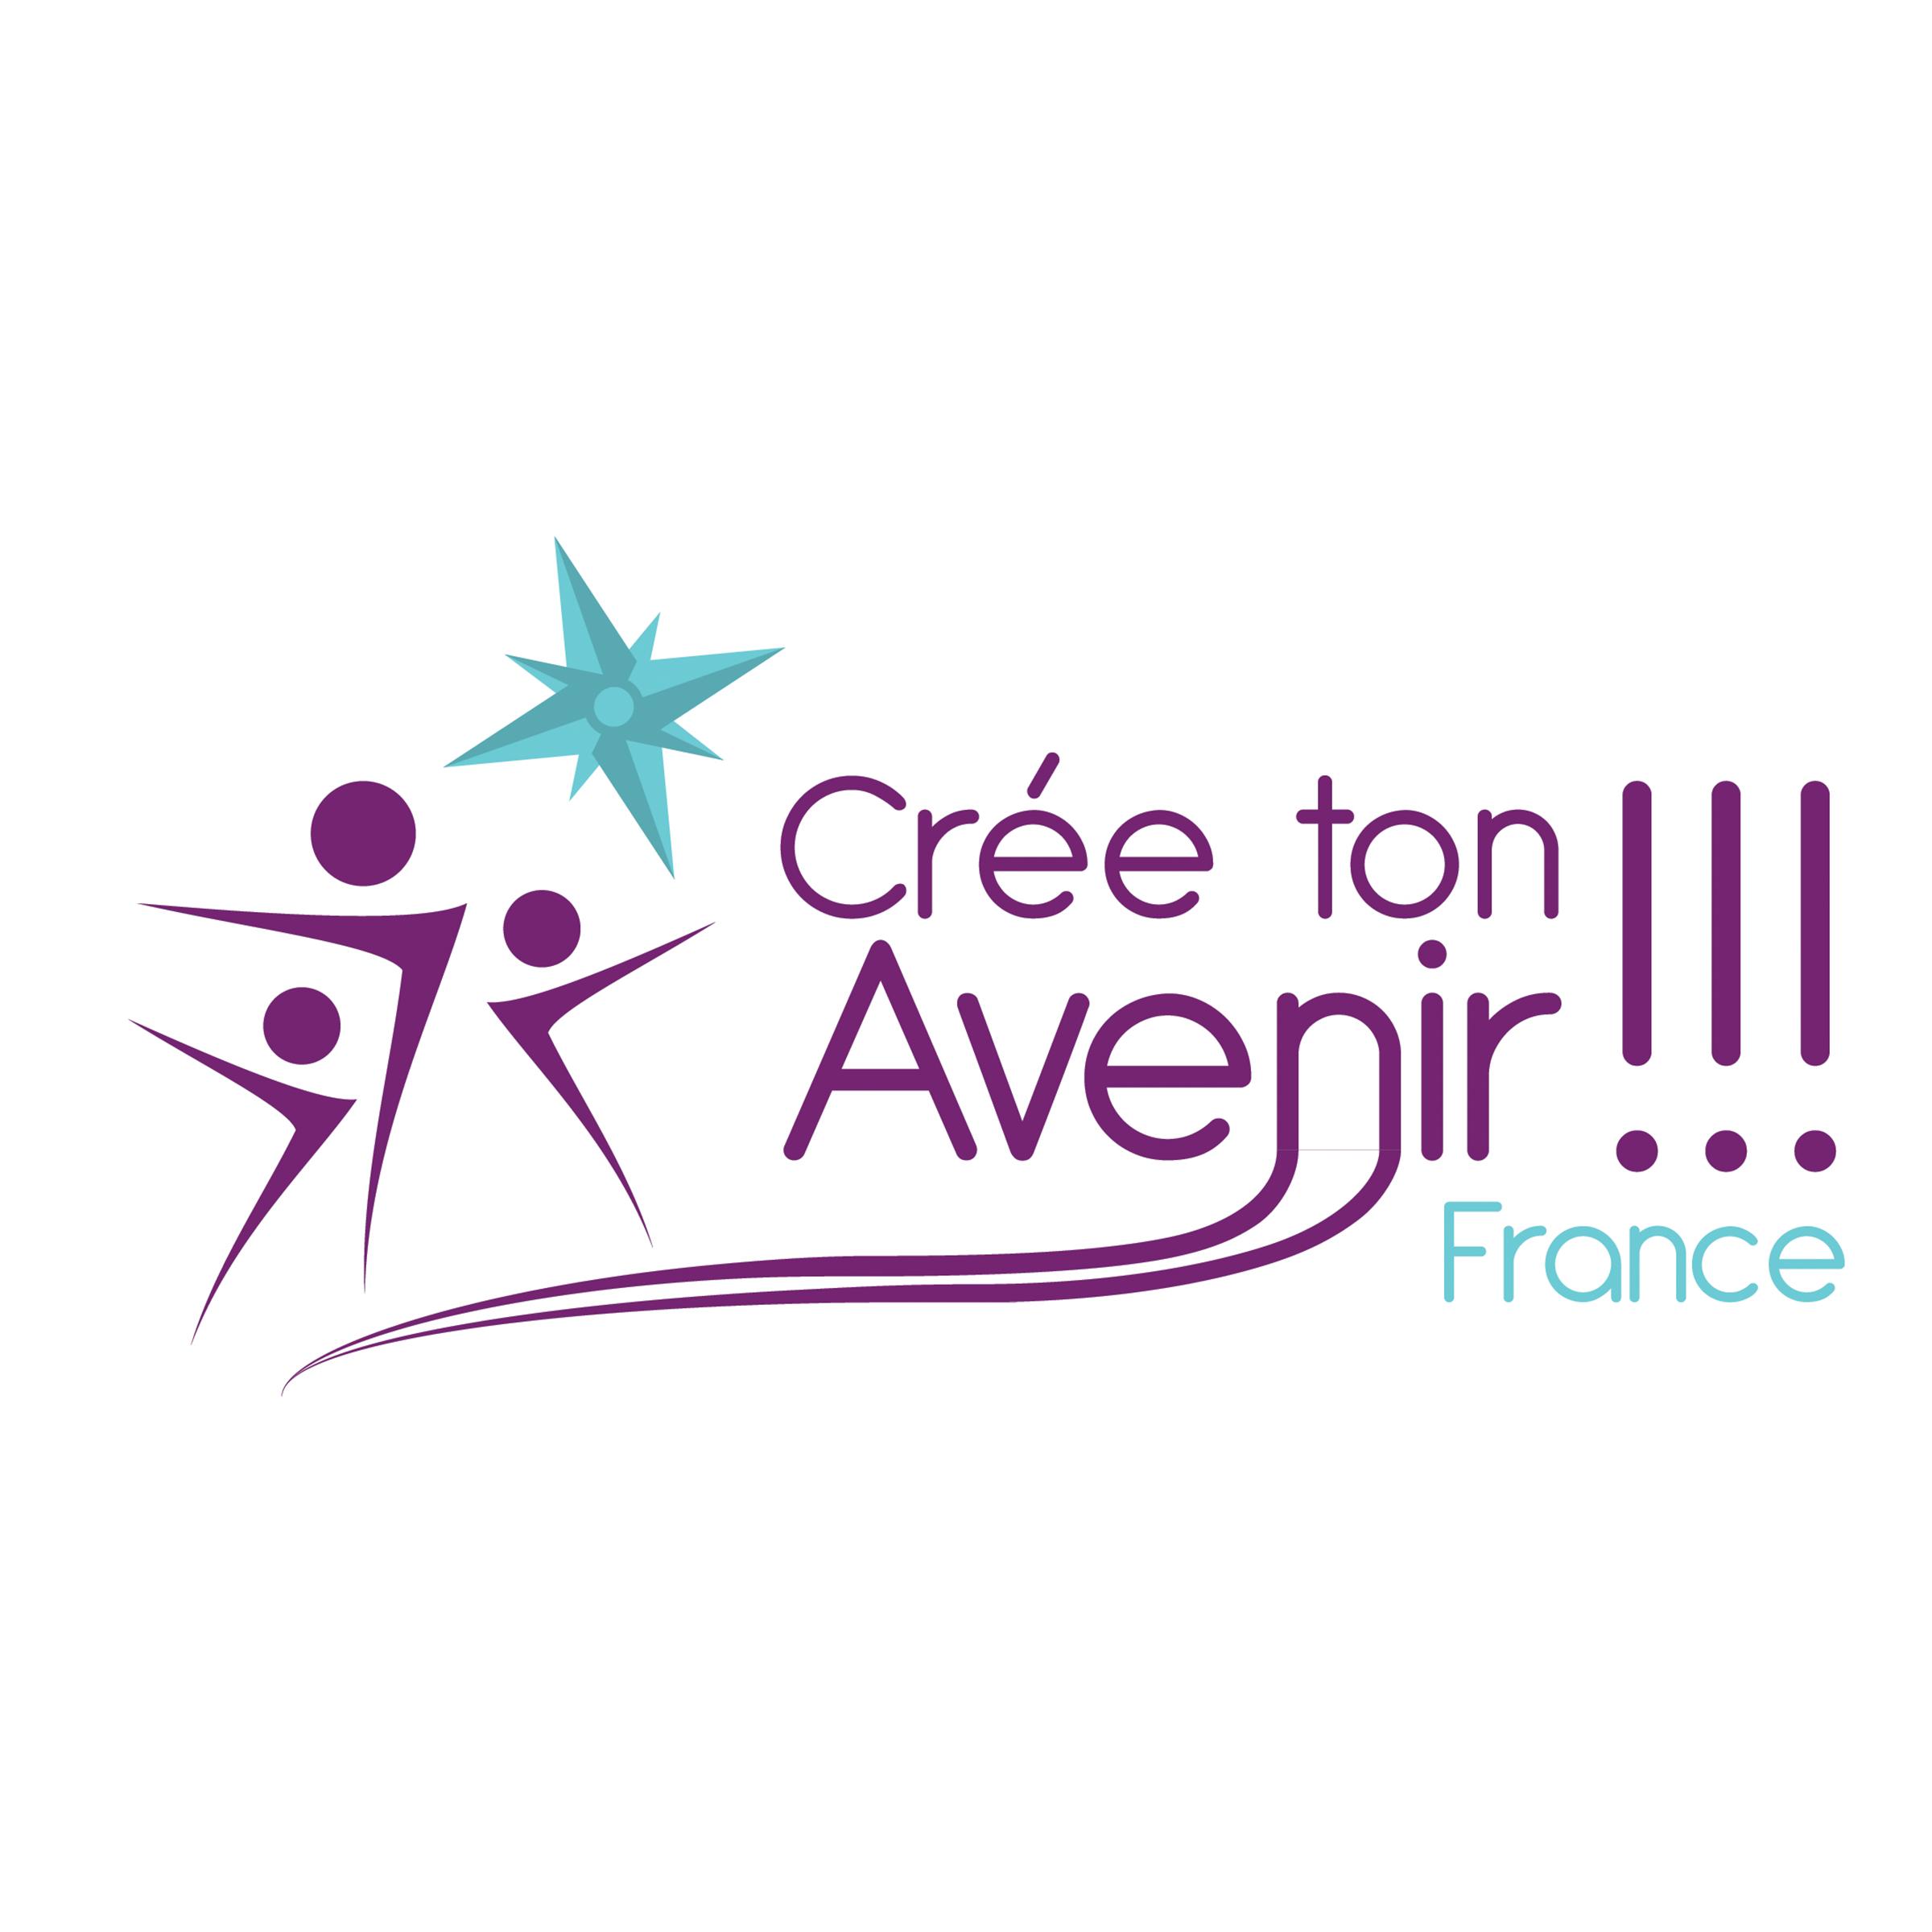 Crée ton avenir France